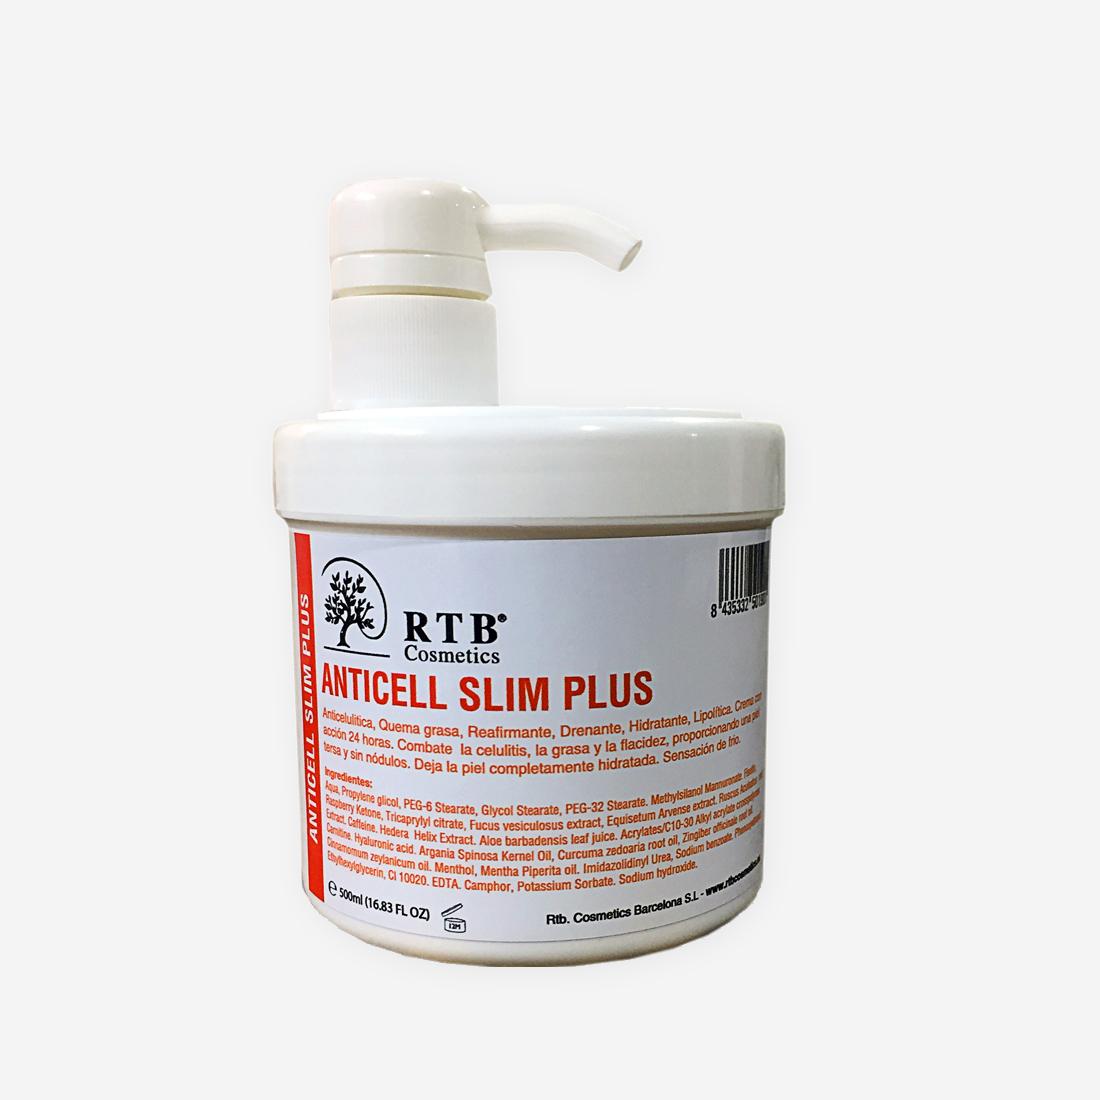 Crema Anticelulítica Slim Plus - RTB Cosmetics